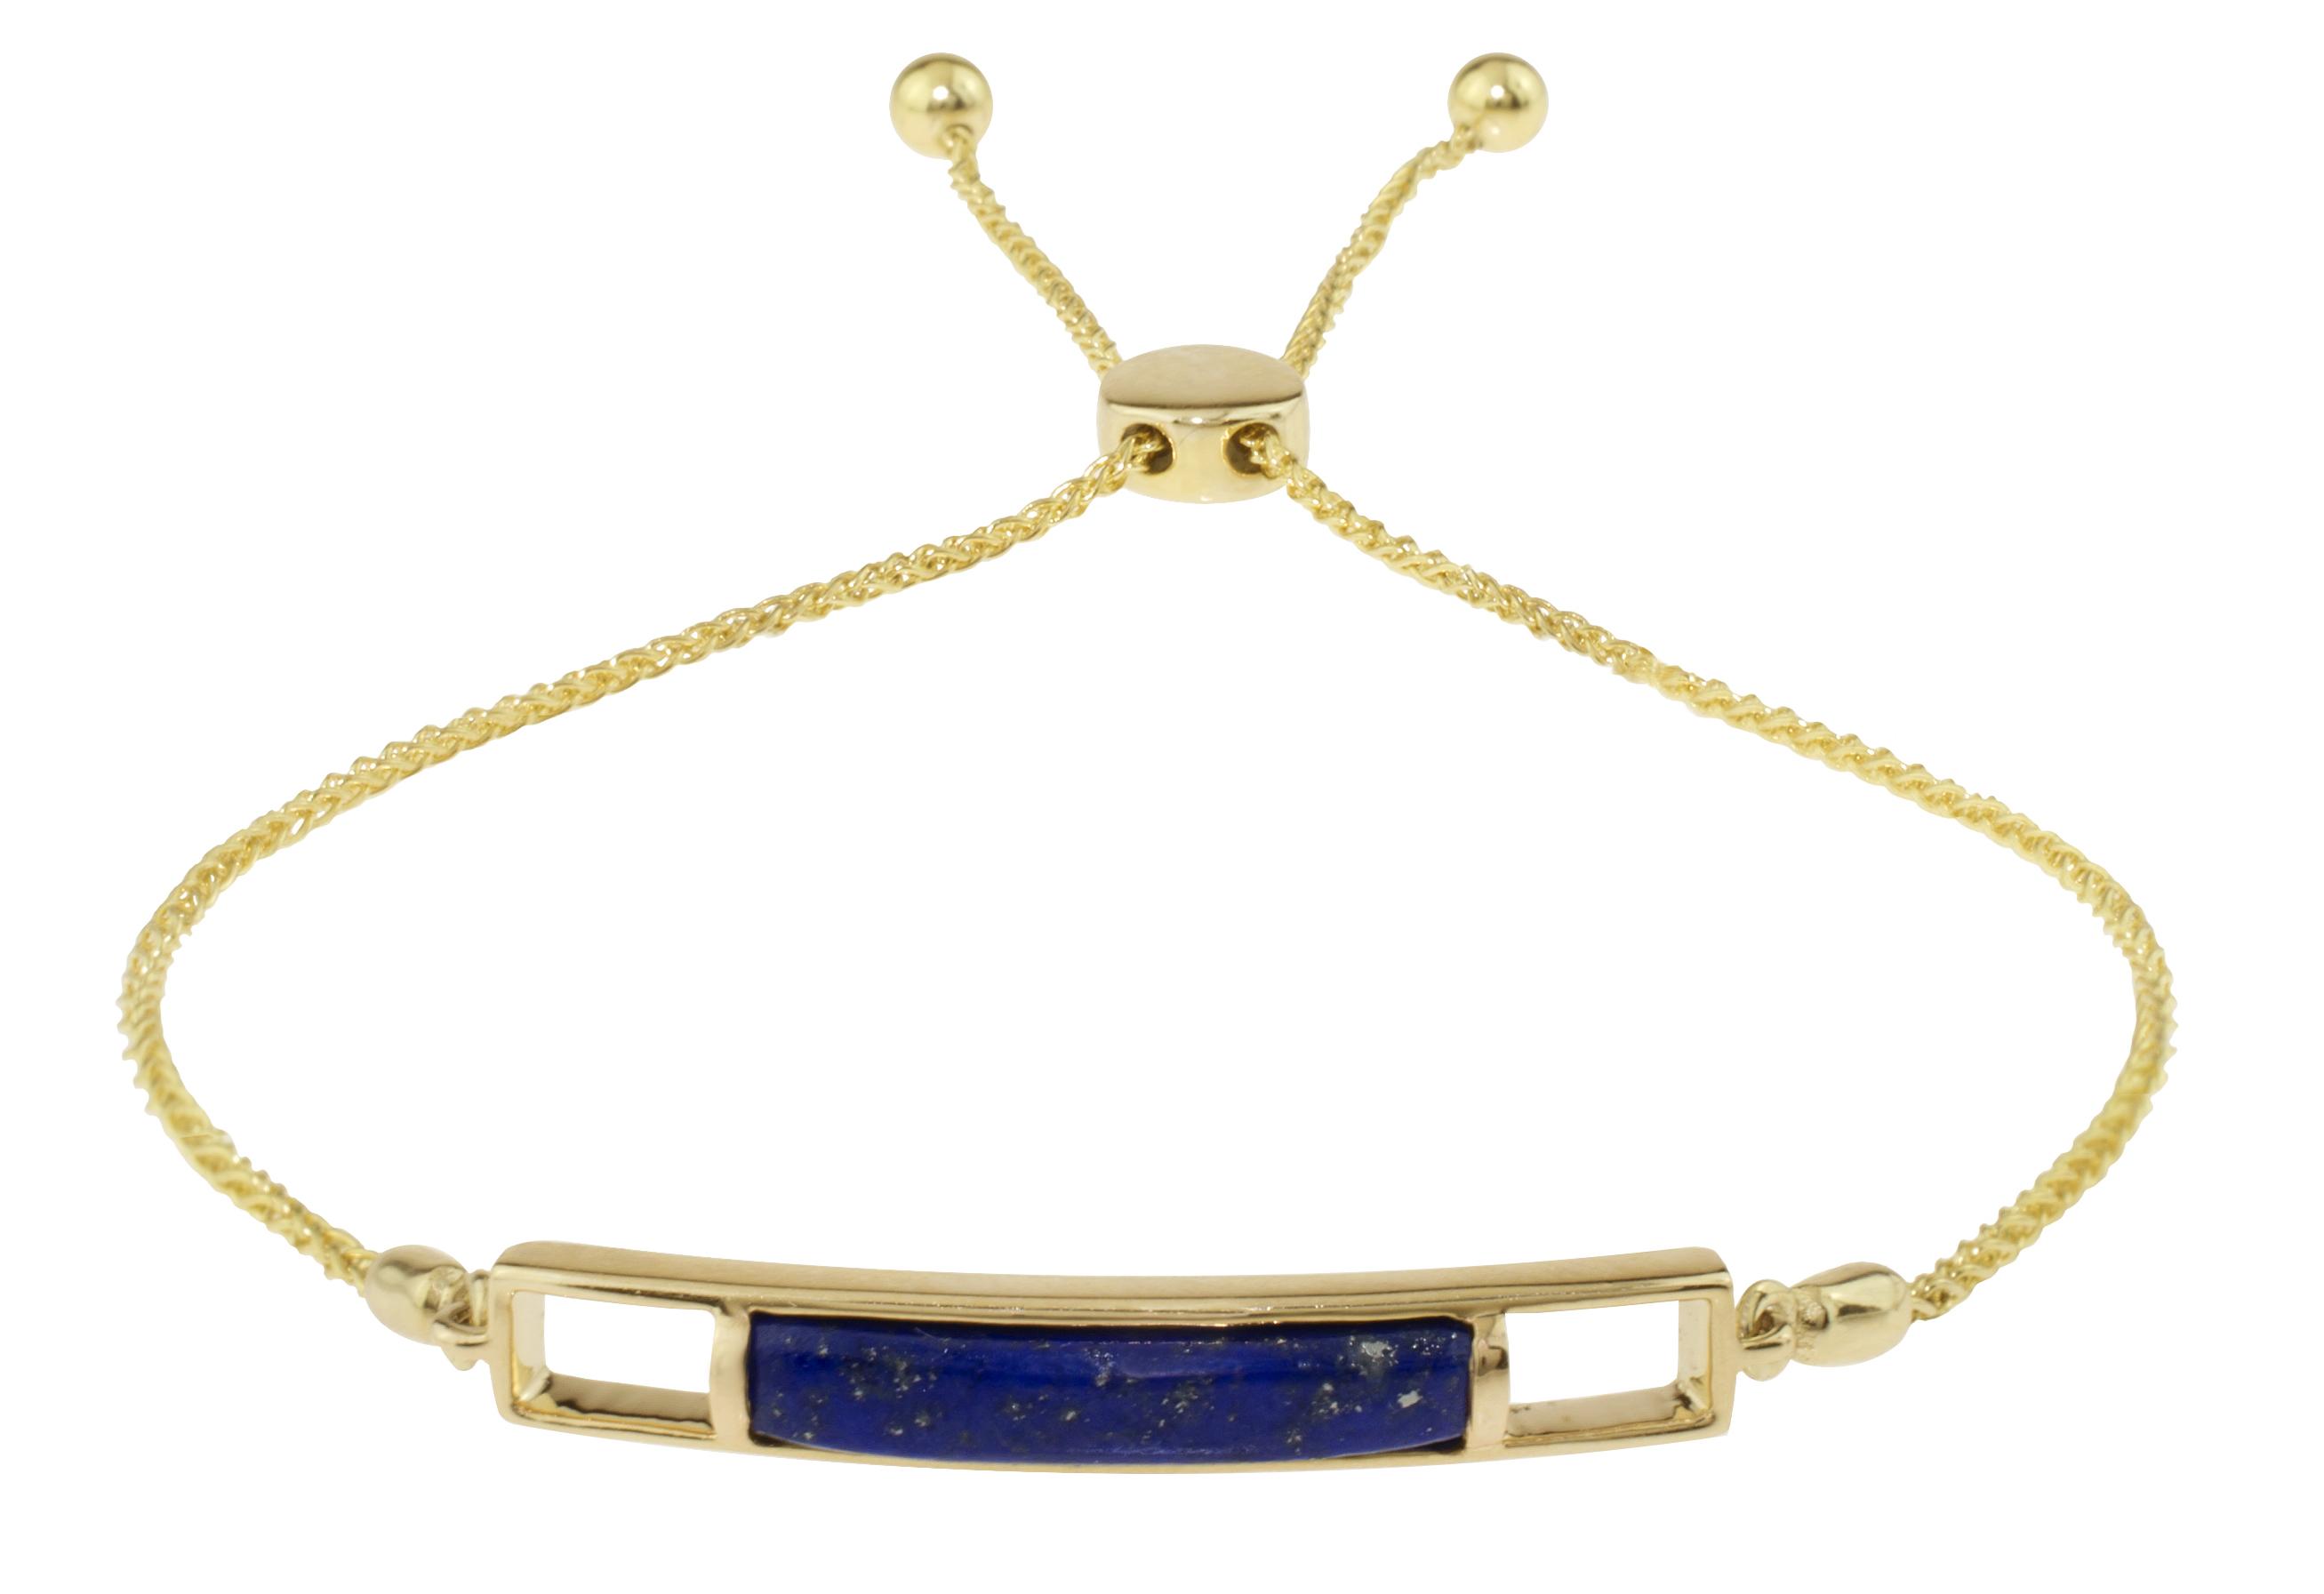 JewelMak lapis bracelet